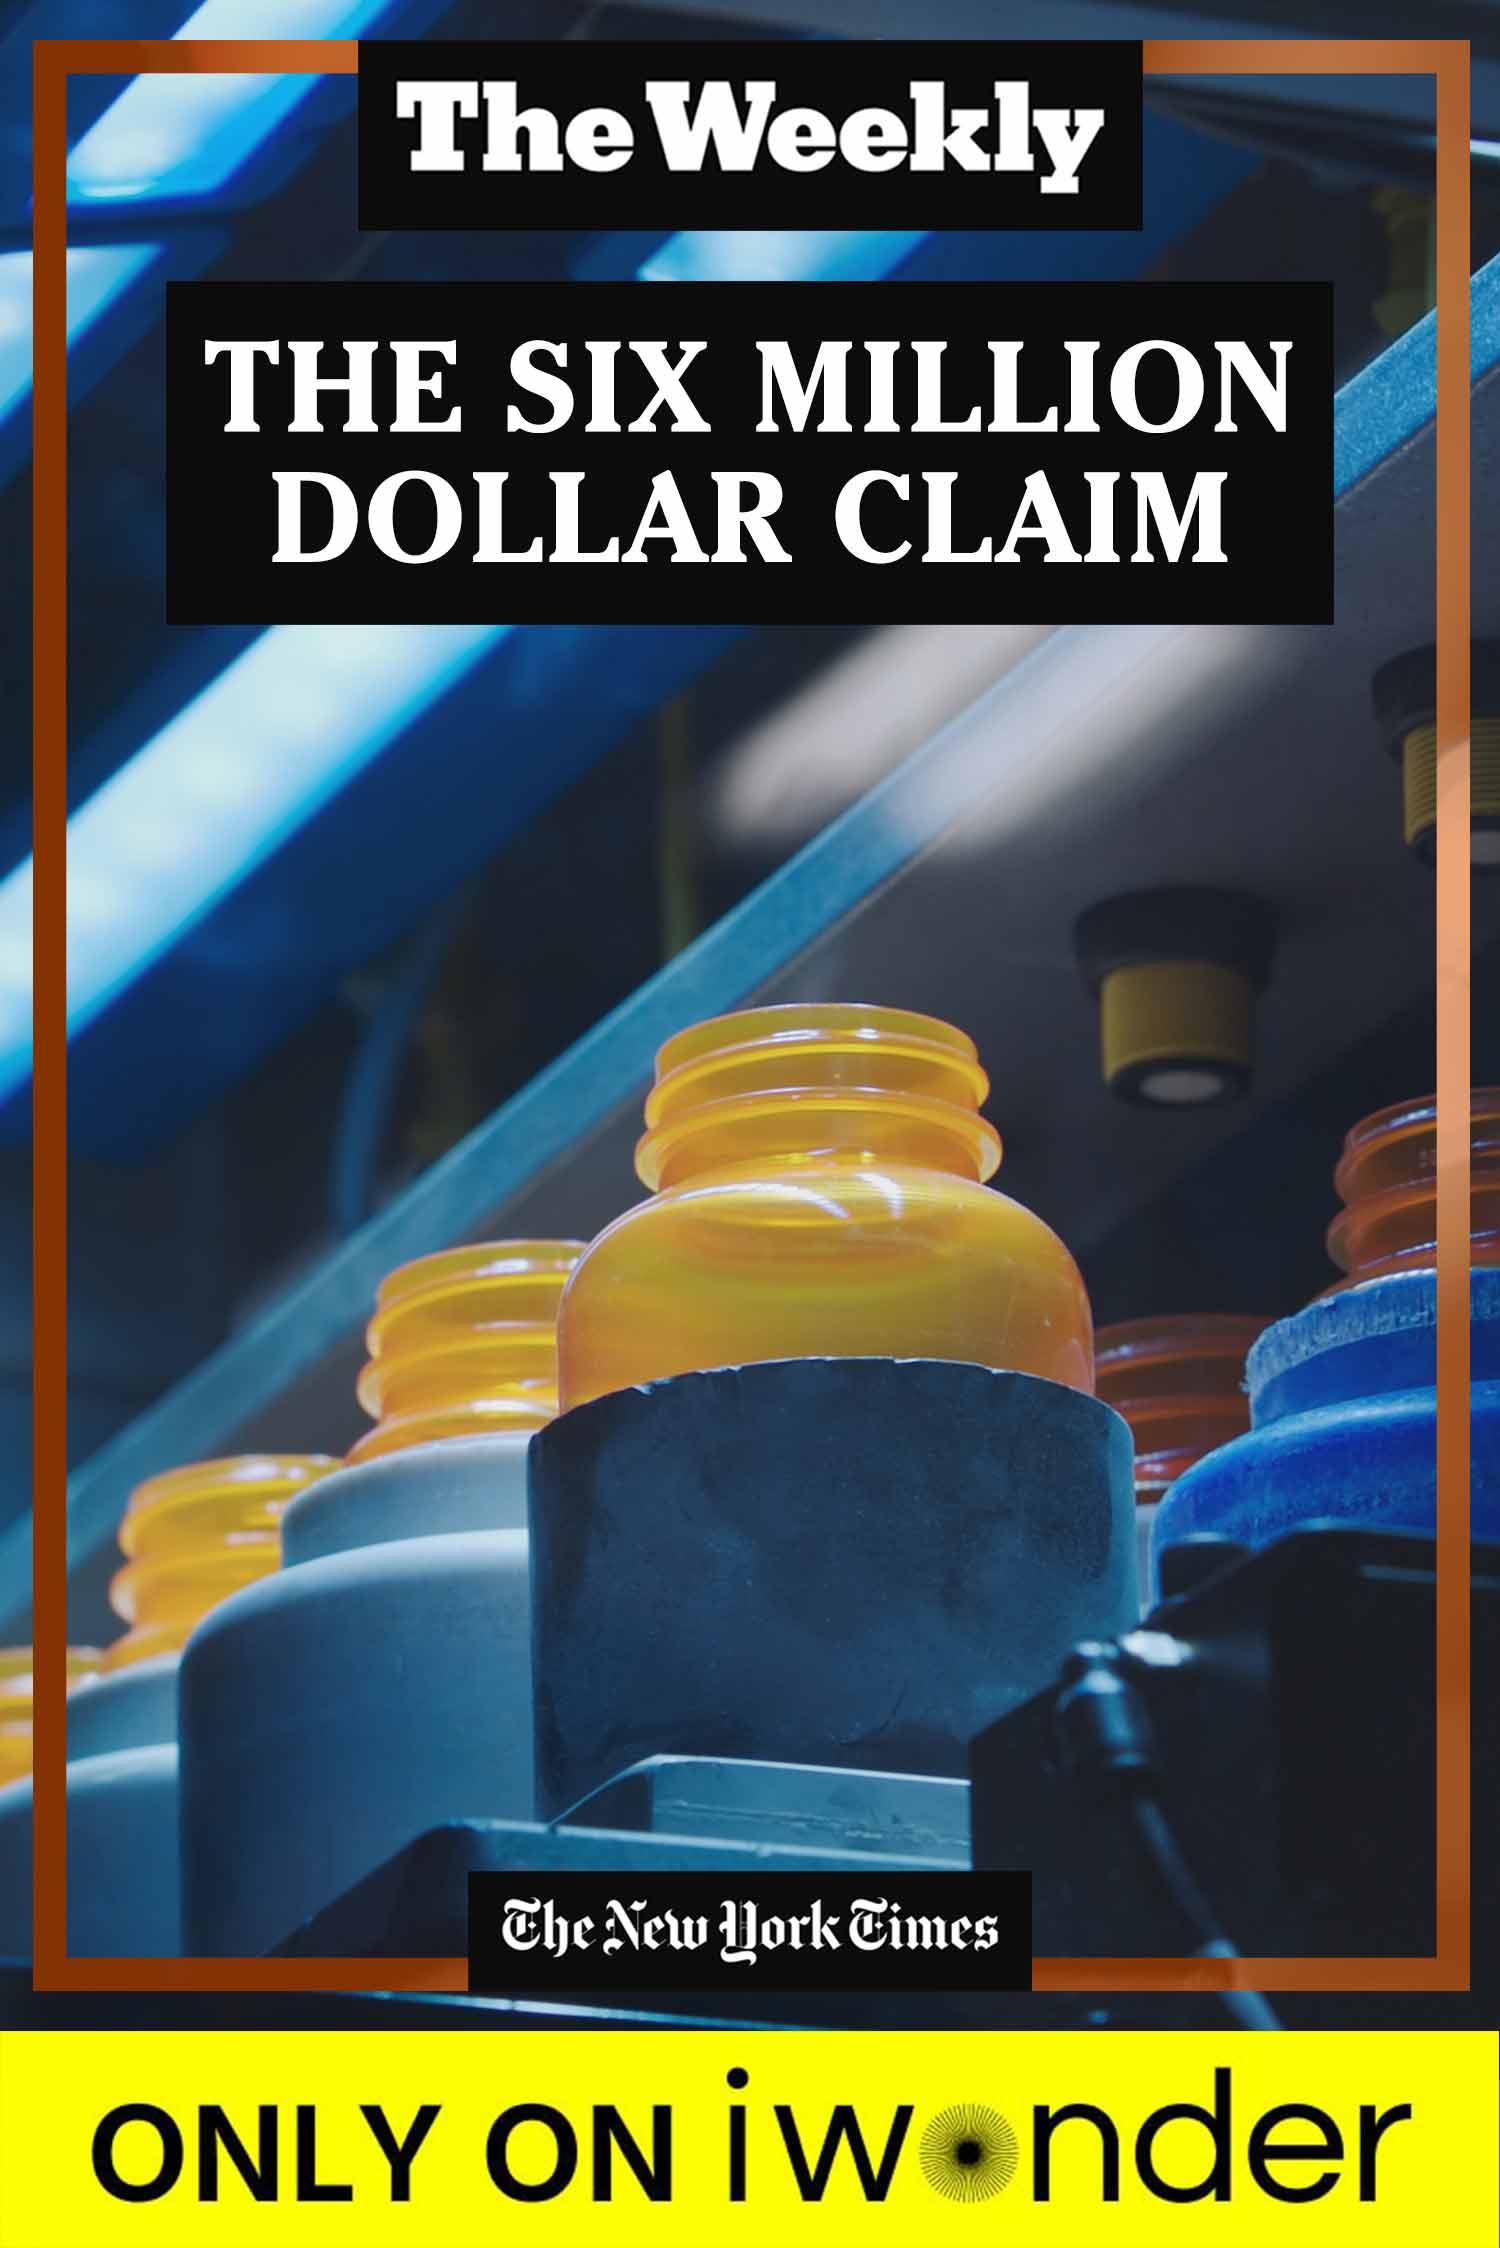 The Weekly: The Six Million Dollar Claim